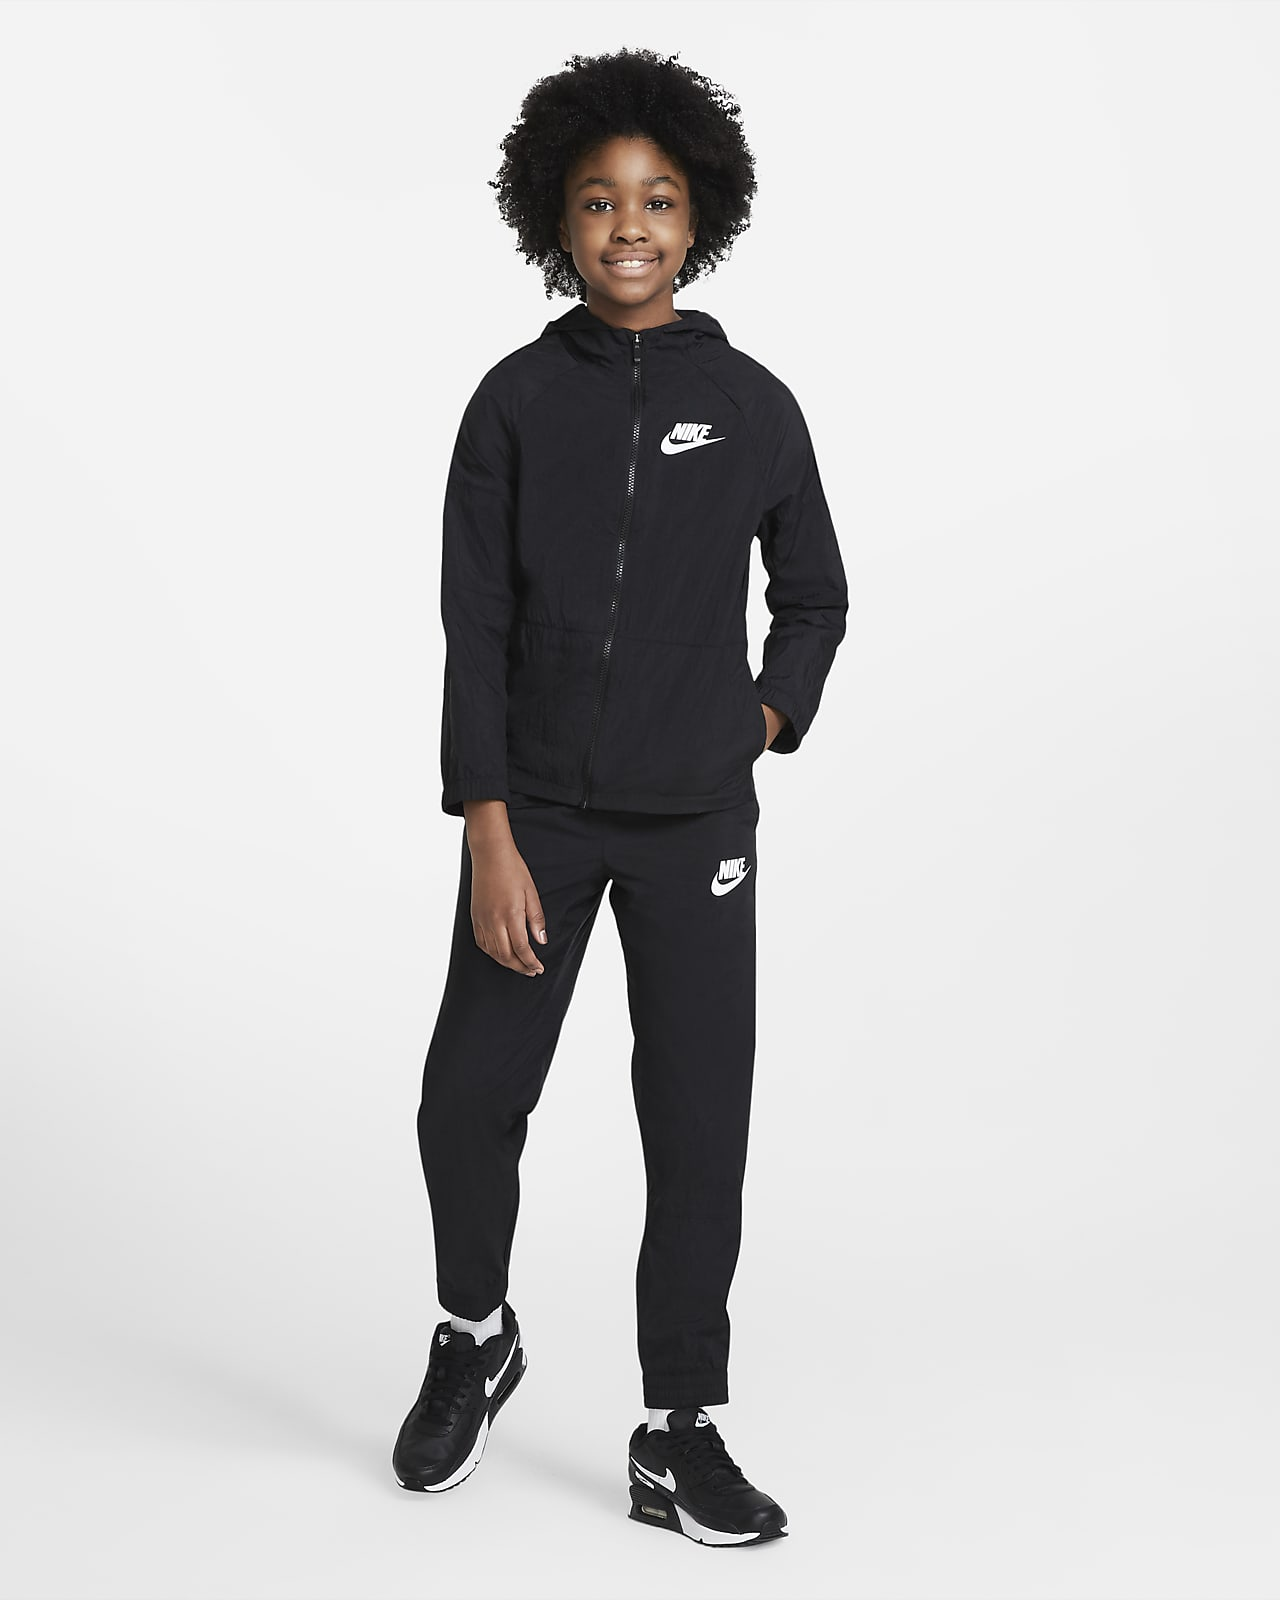 Tuta in woven Nike Sportswear - Ragazzi